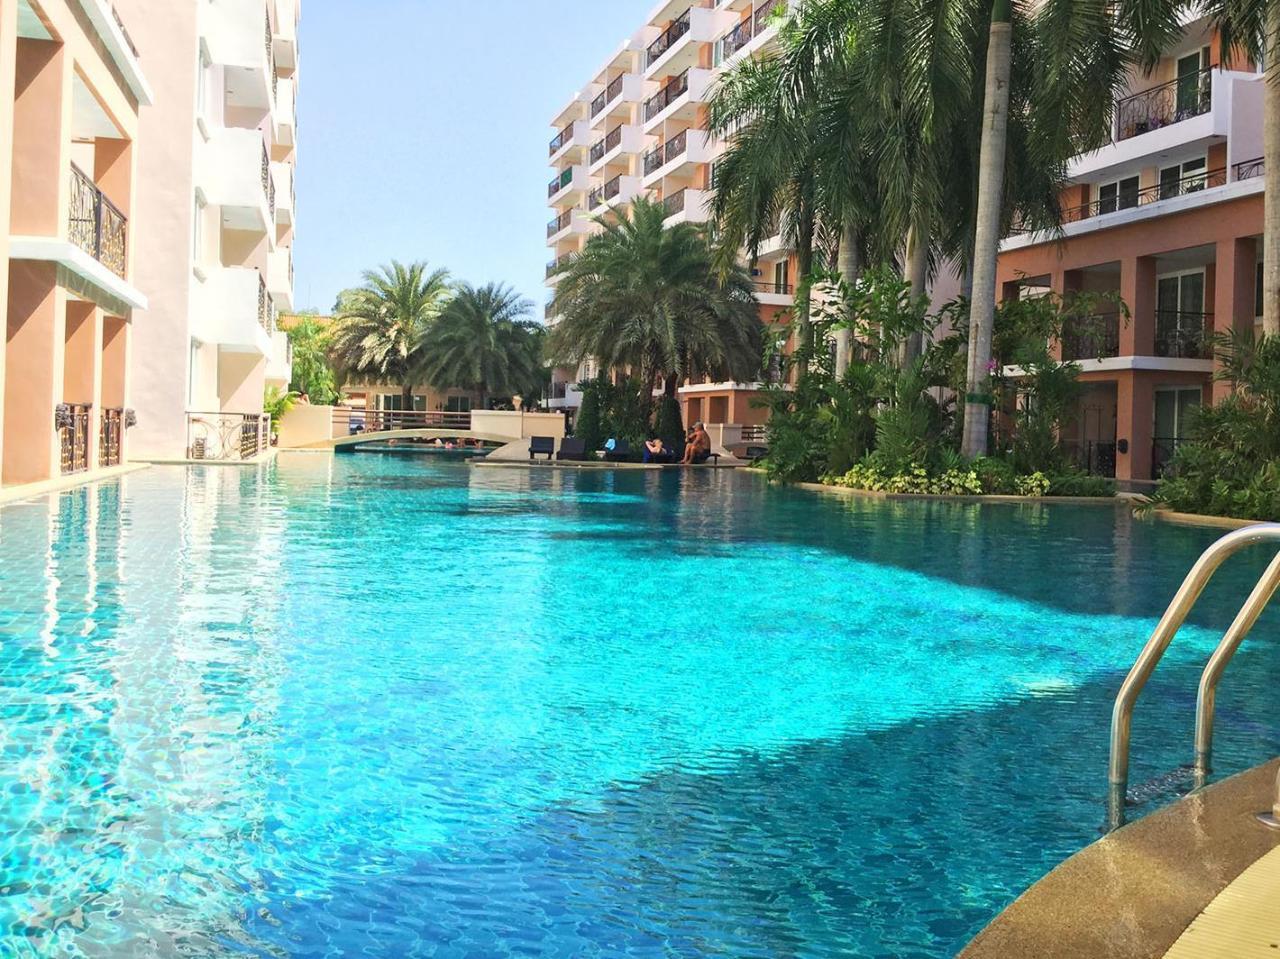 Paradise Park Jomtien by Pattaya Sunny REntals (Paradise Park Jomtien by Pattaya Sunny Rentals)